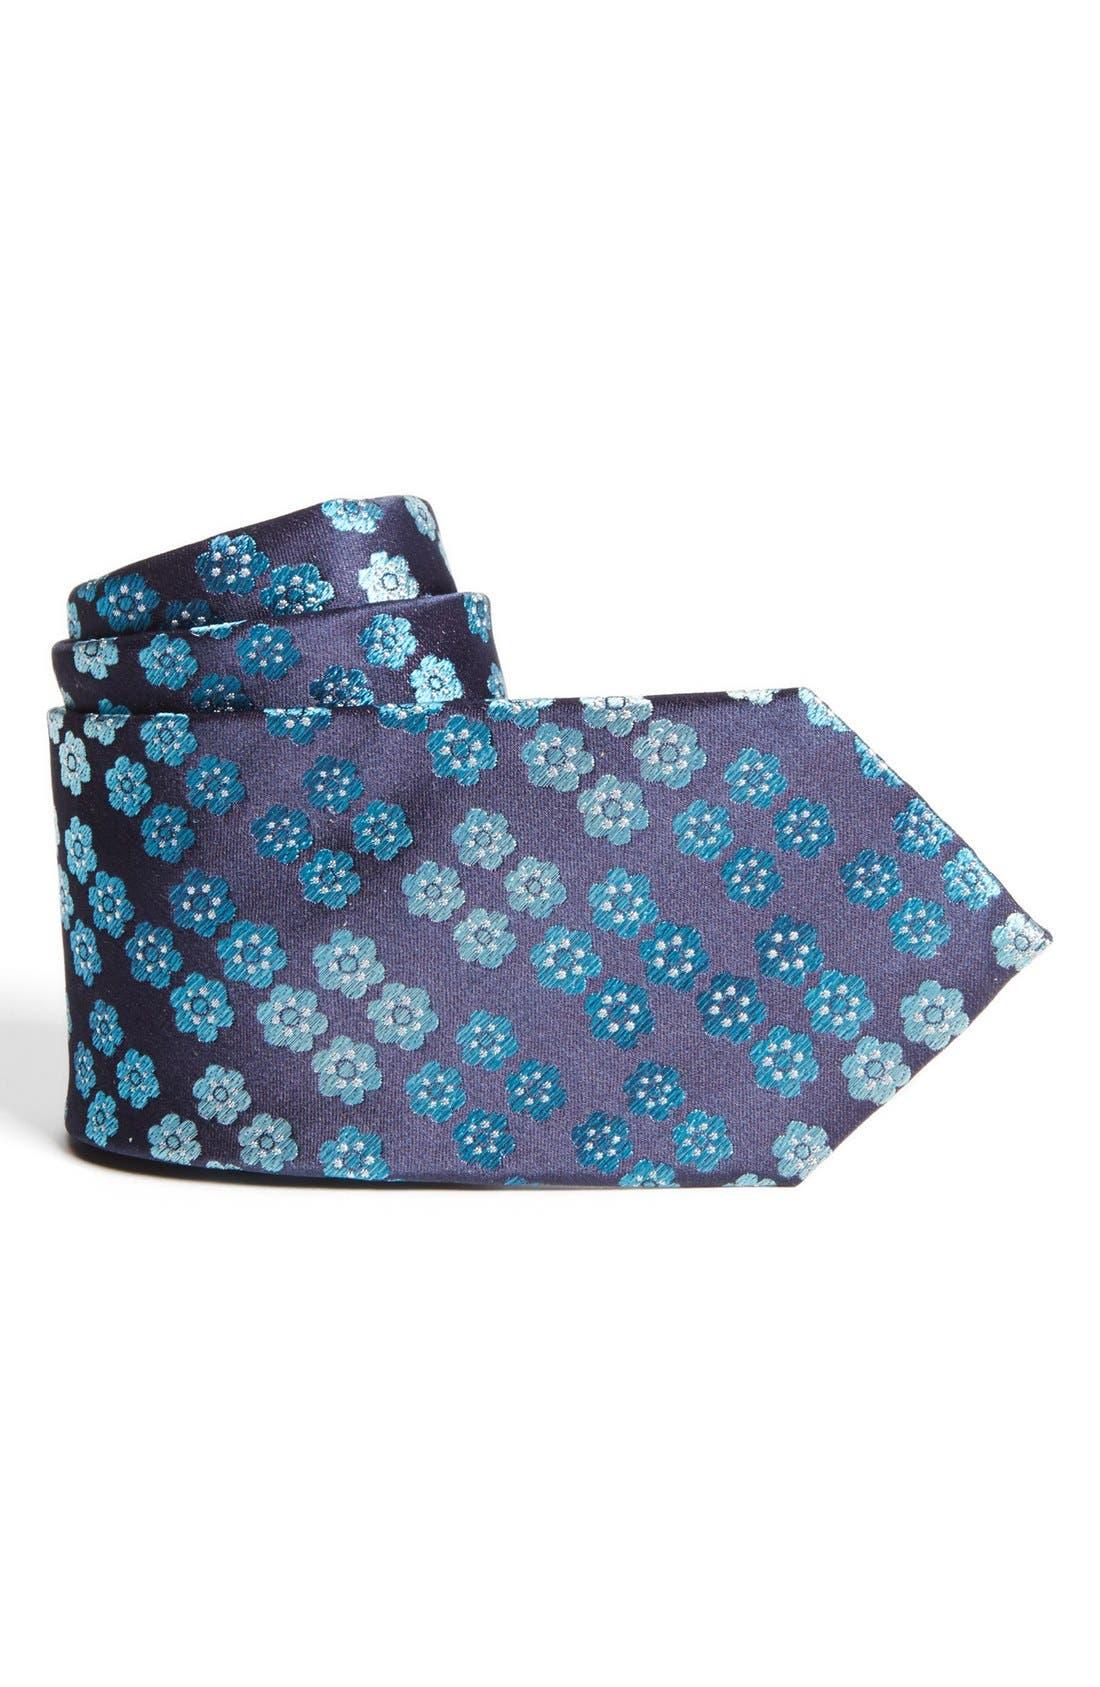 Alternate Image 1 Selected - Joseph Abboud Woven Silk Tie (Boys)